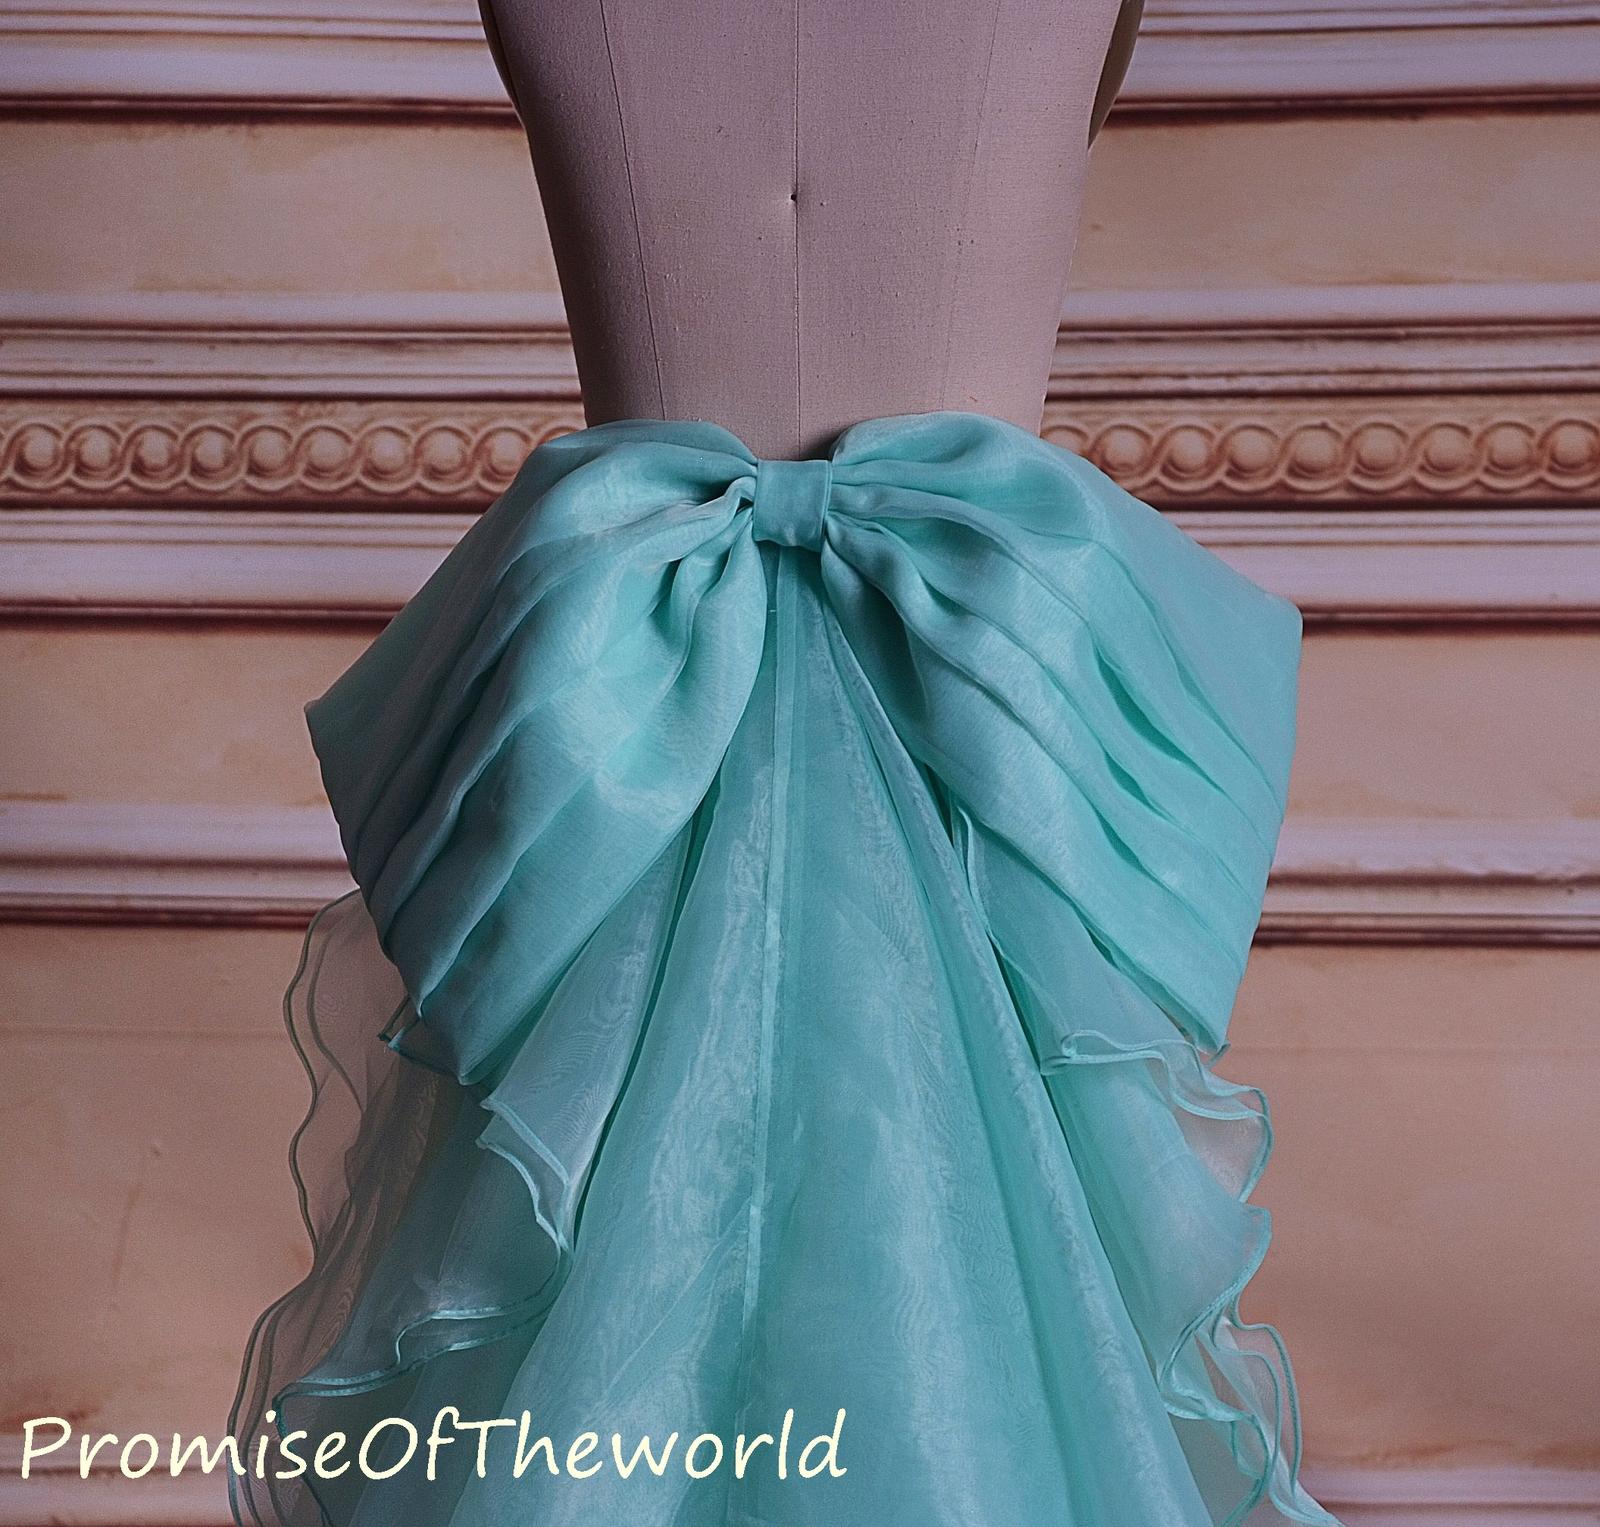 Mint green organza ruffled detachable train organza bridal wedding dress train